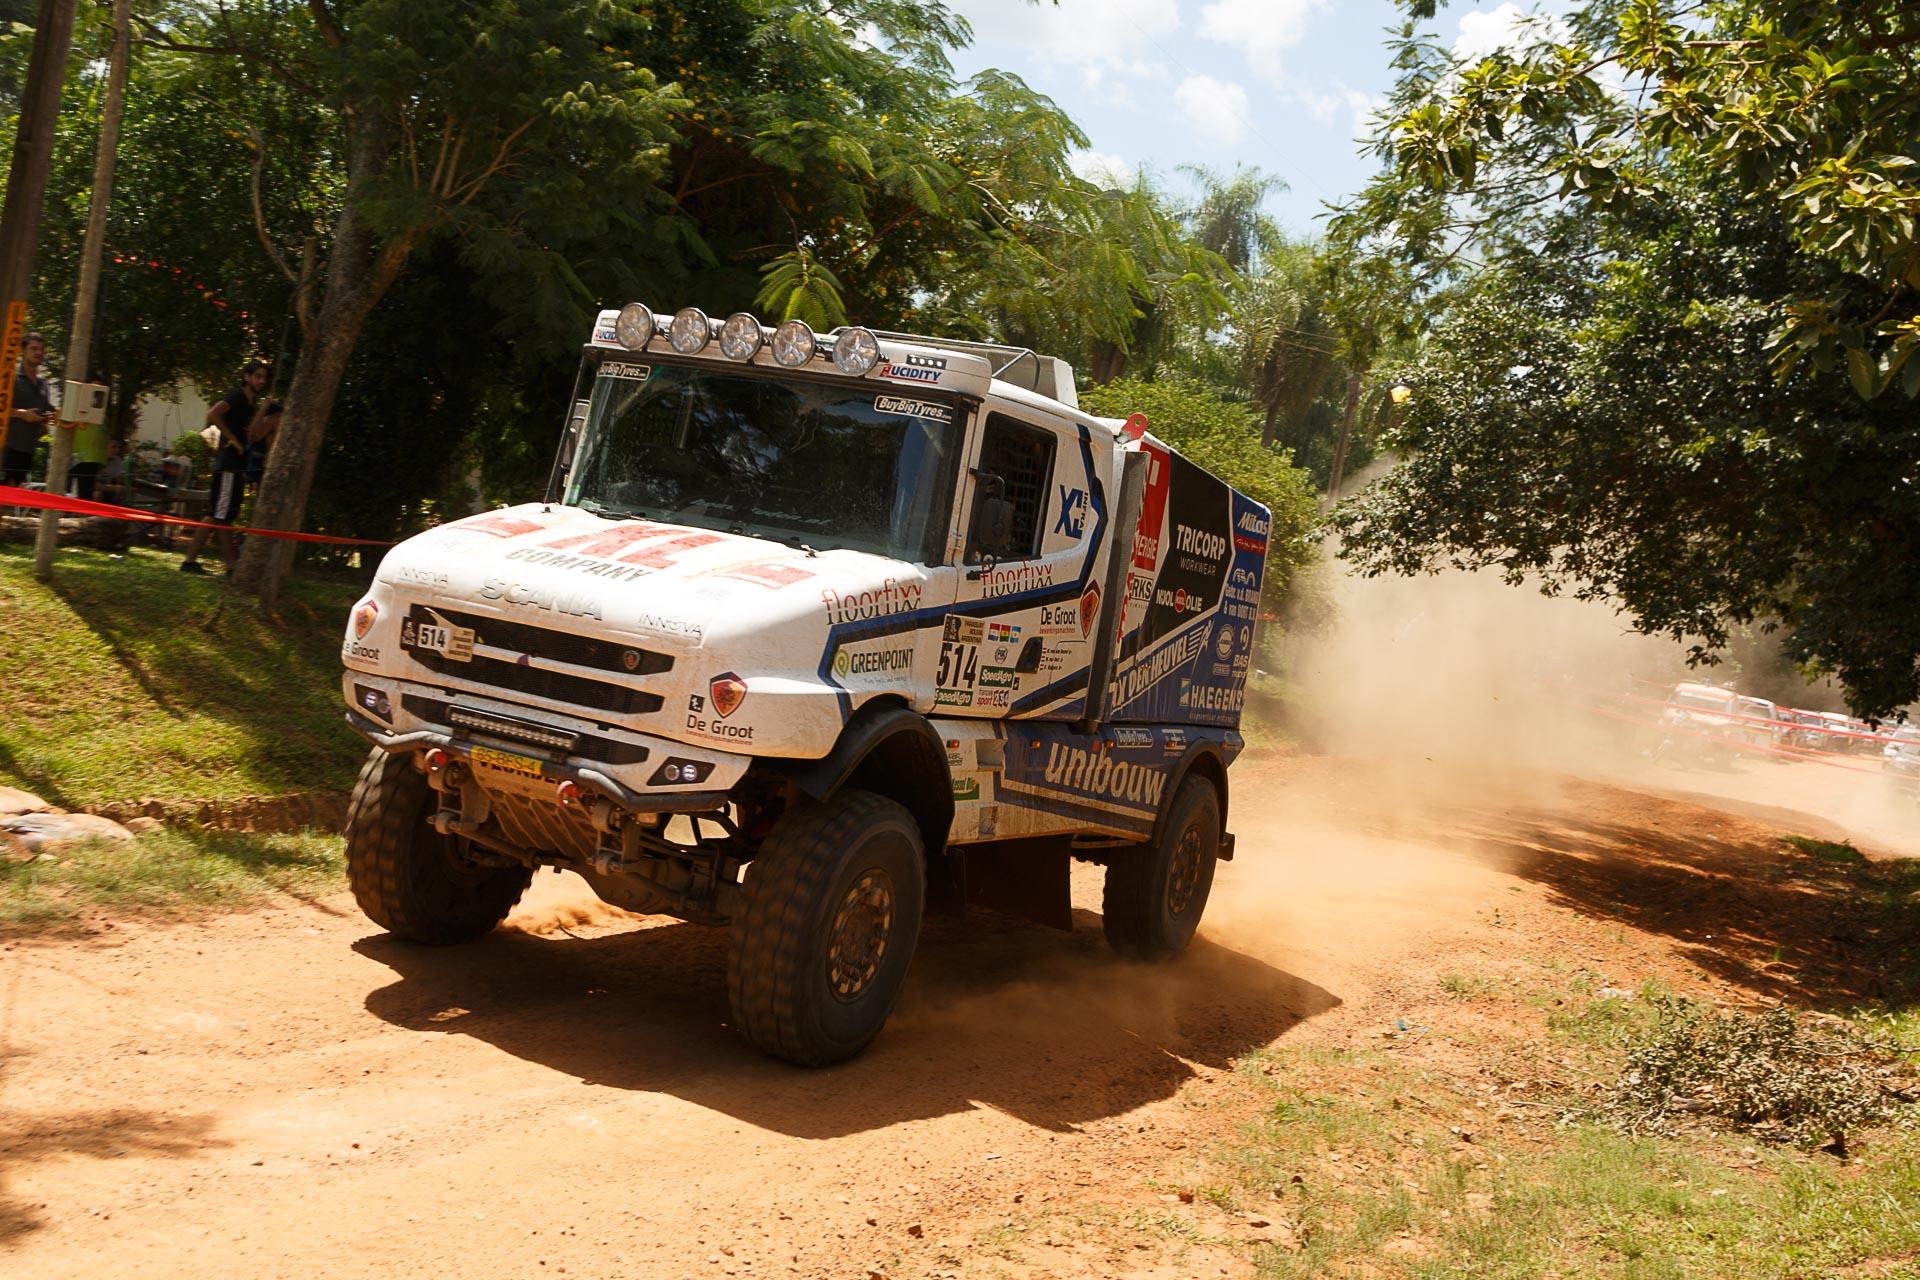 Dakarspeed: Etappe 2: Resistencia – San Miguel de Tucuman - Autosportnieuws.be